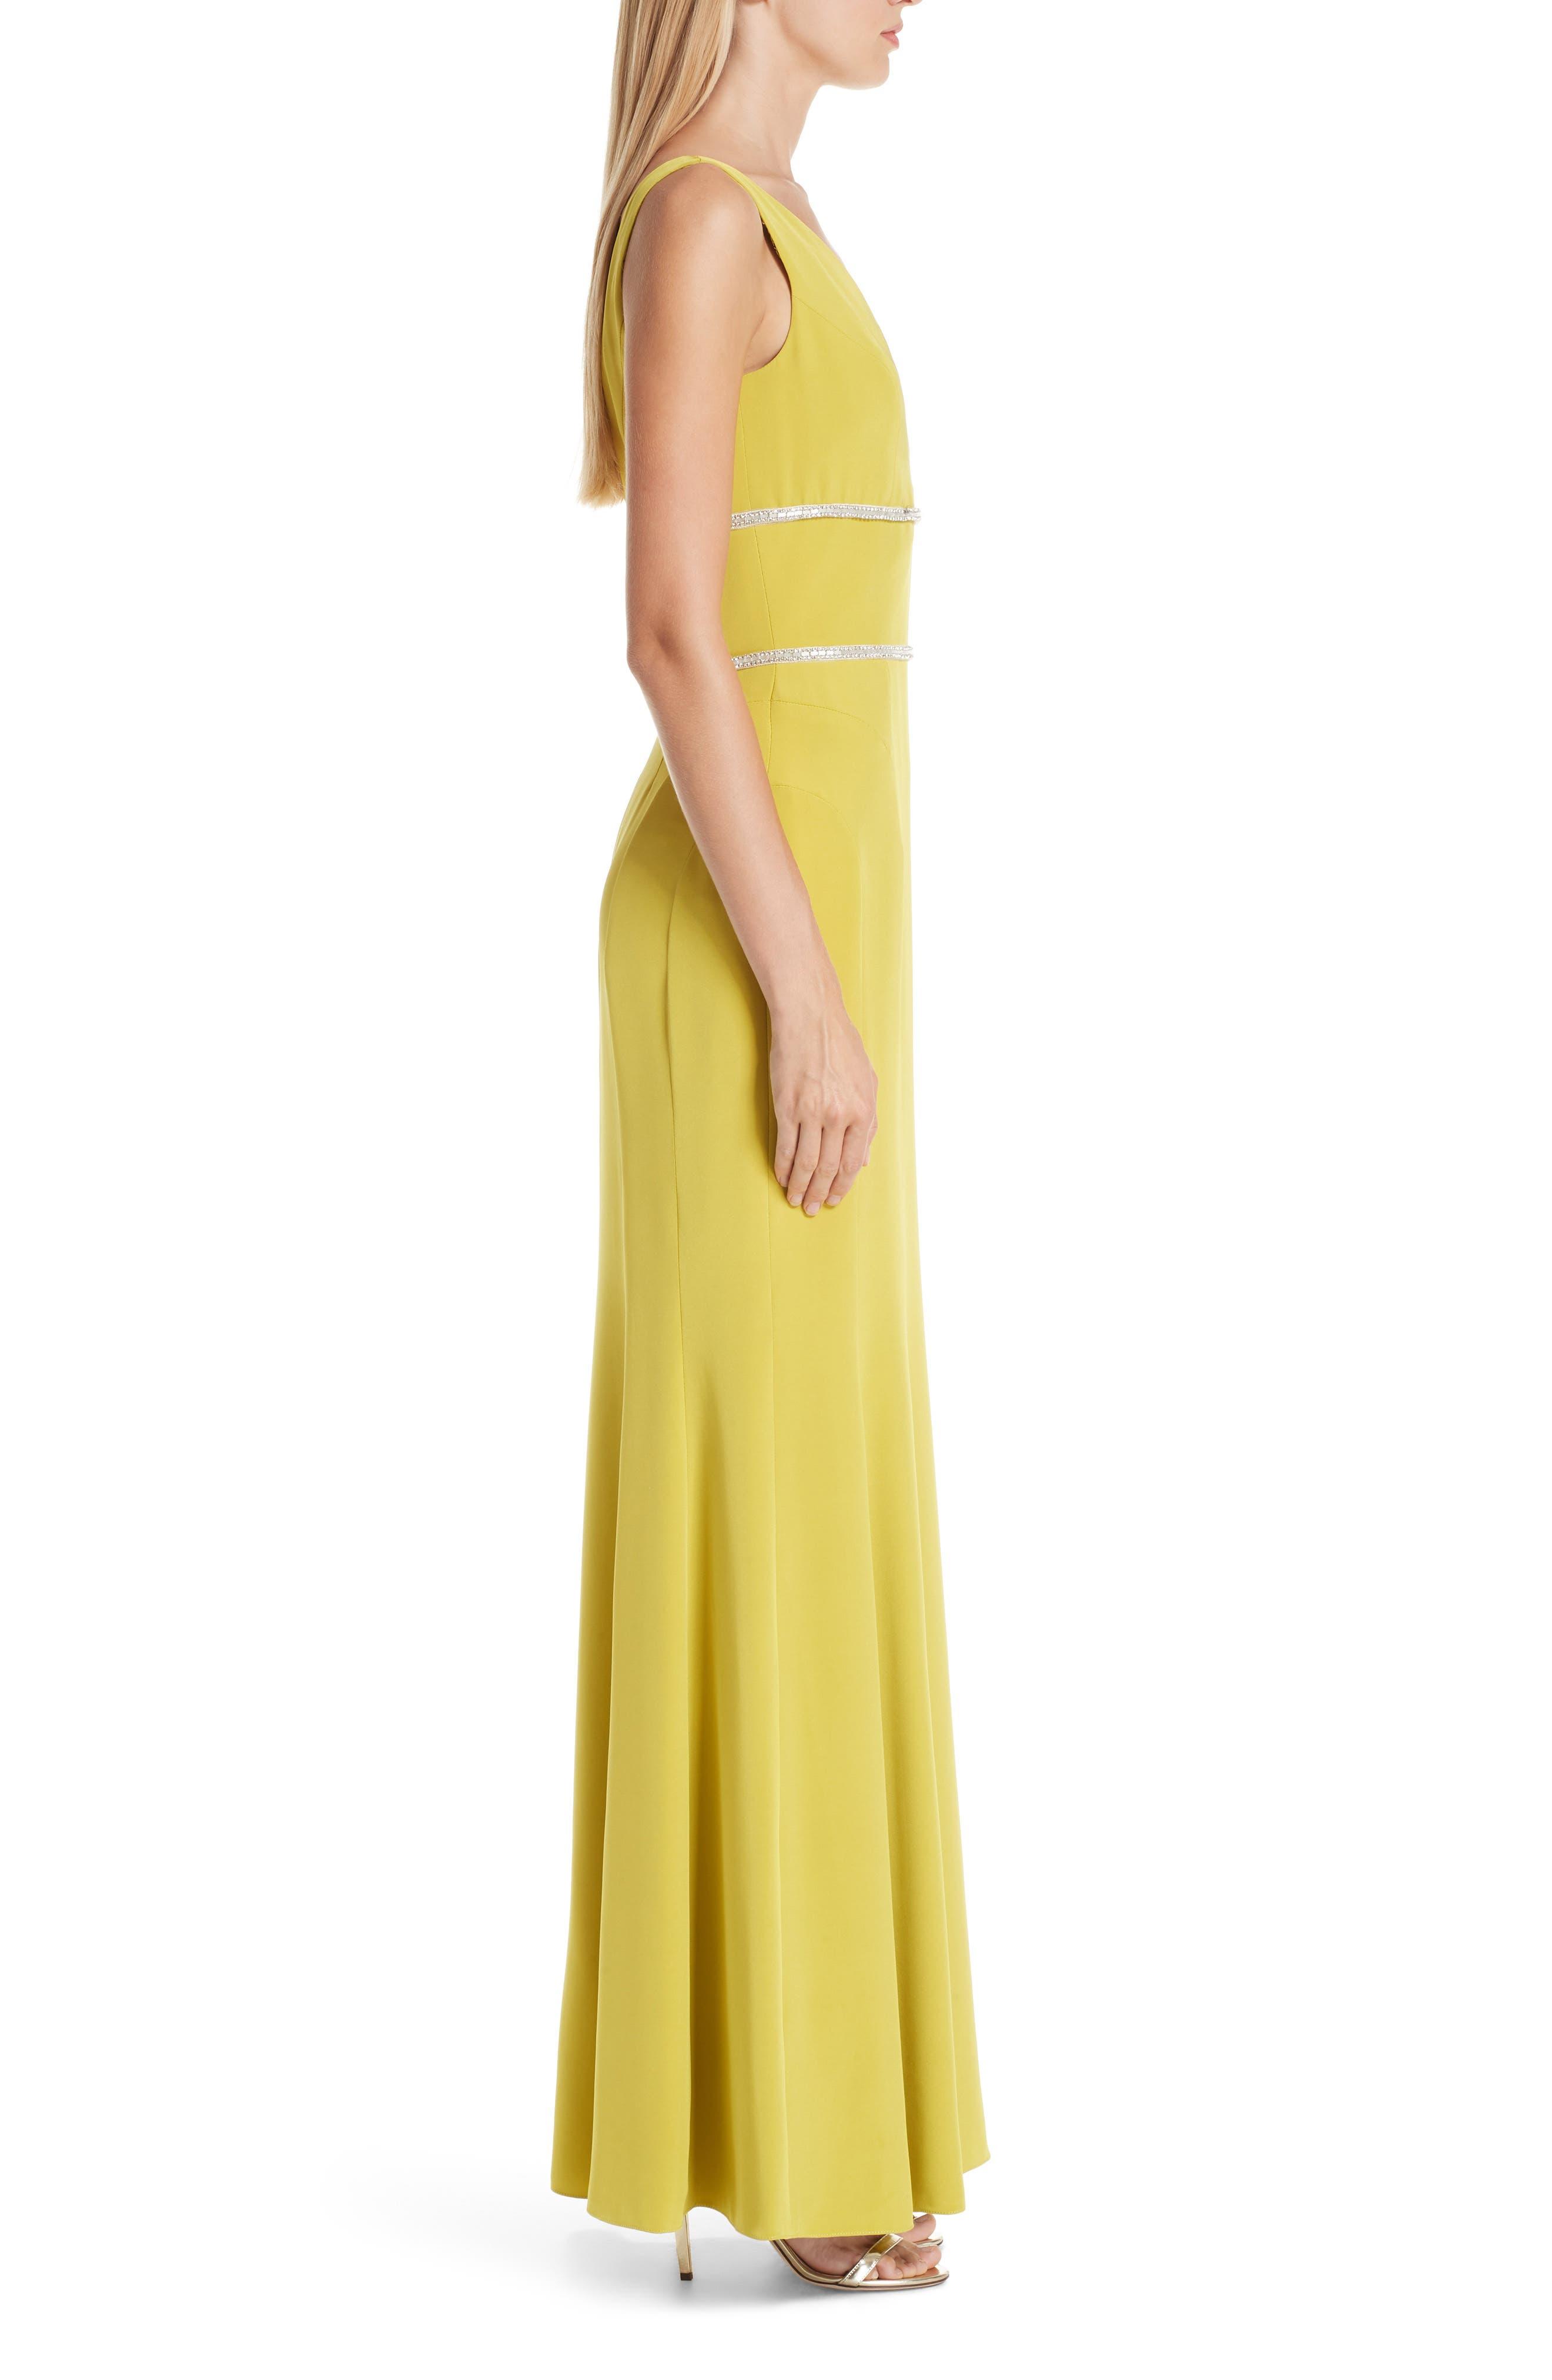 VERDIN,                             Embellished Silk V-Neck Evening Dress,                             Alternate thumbnail 3, color,                             CITRUS